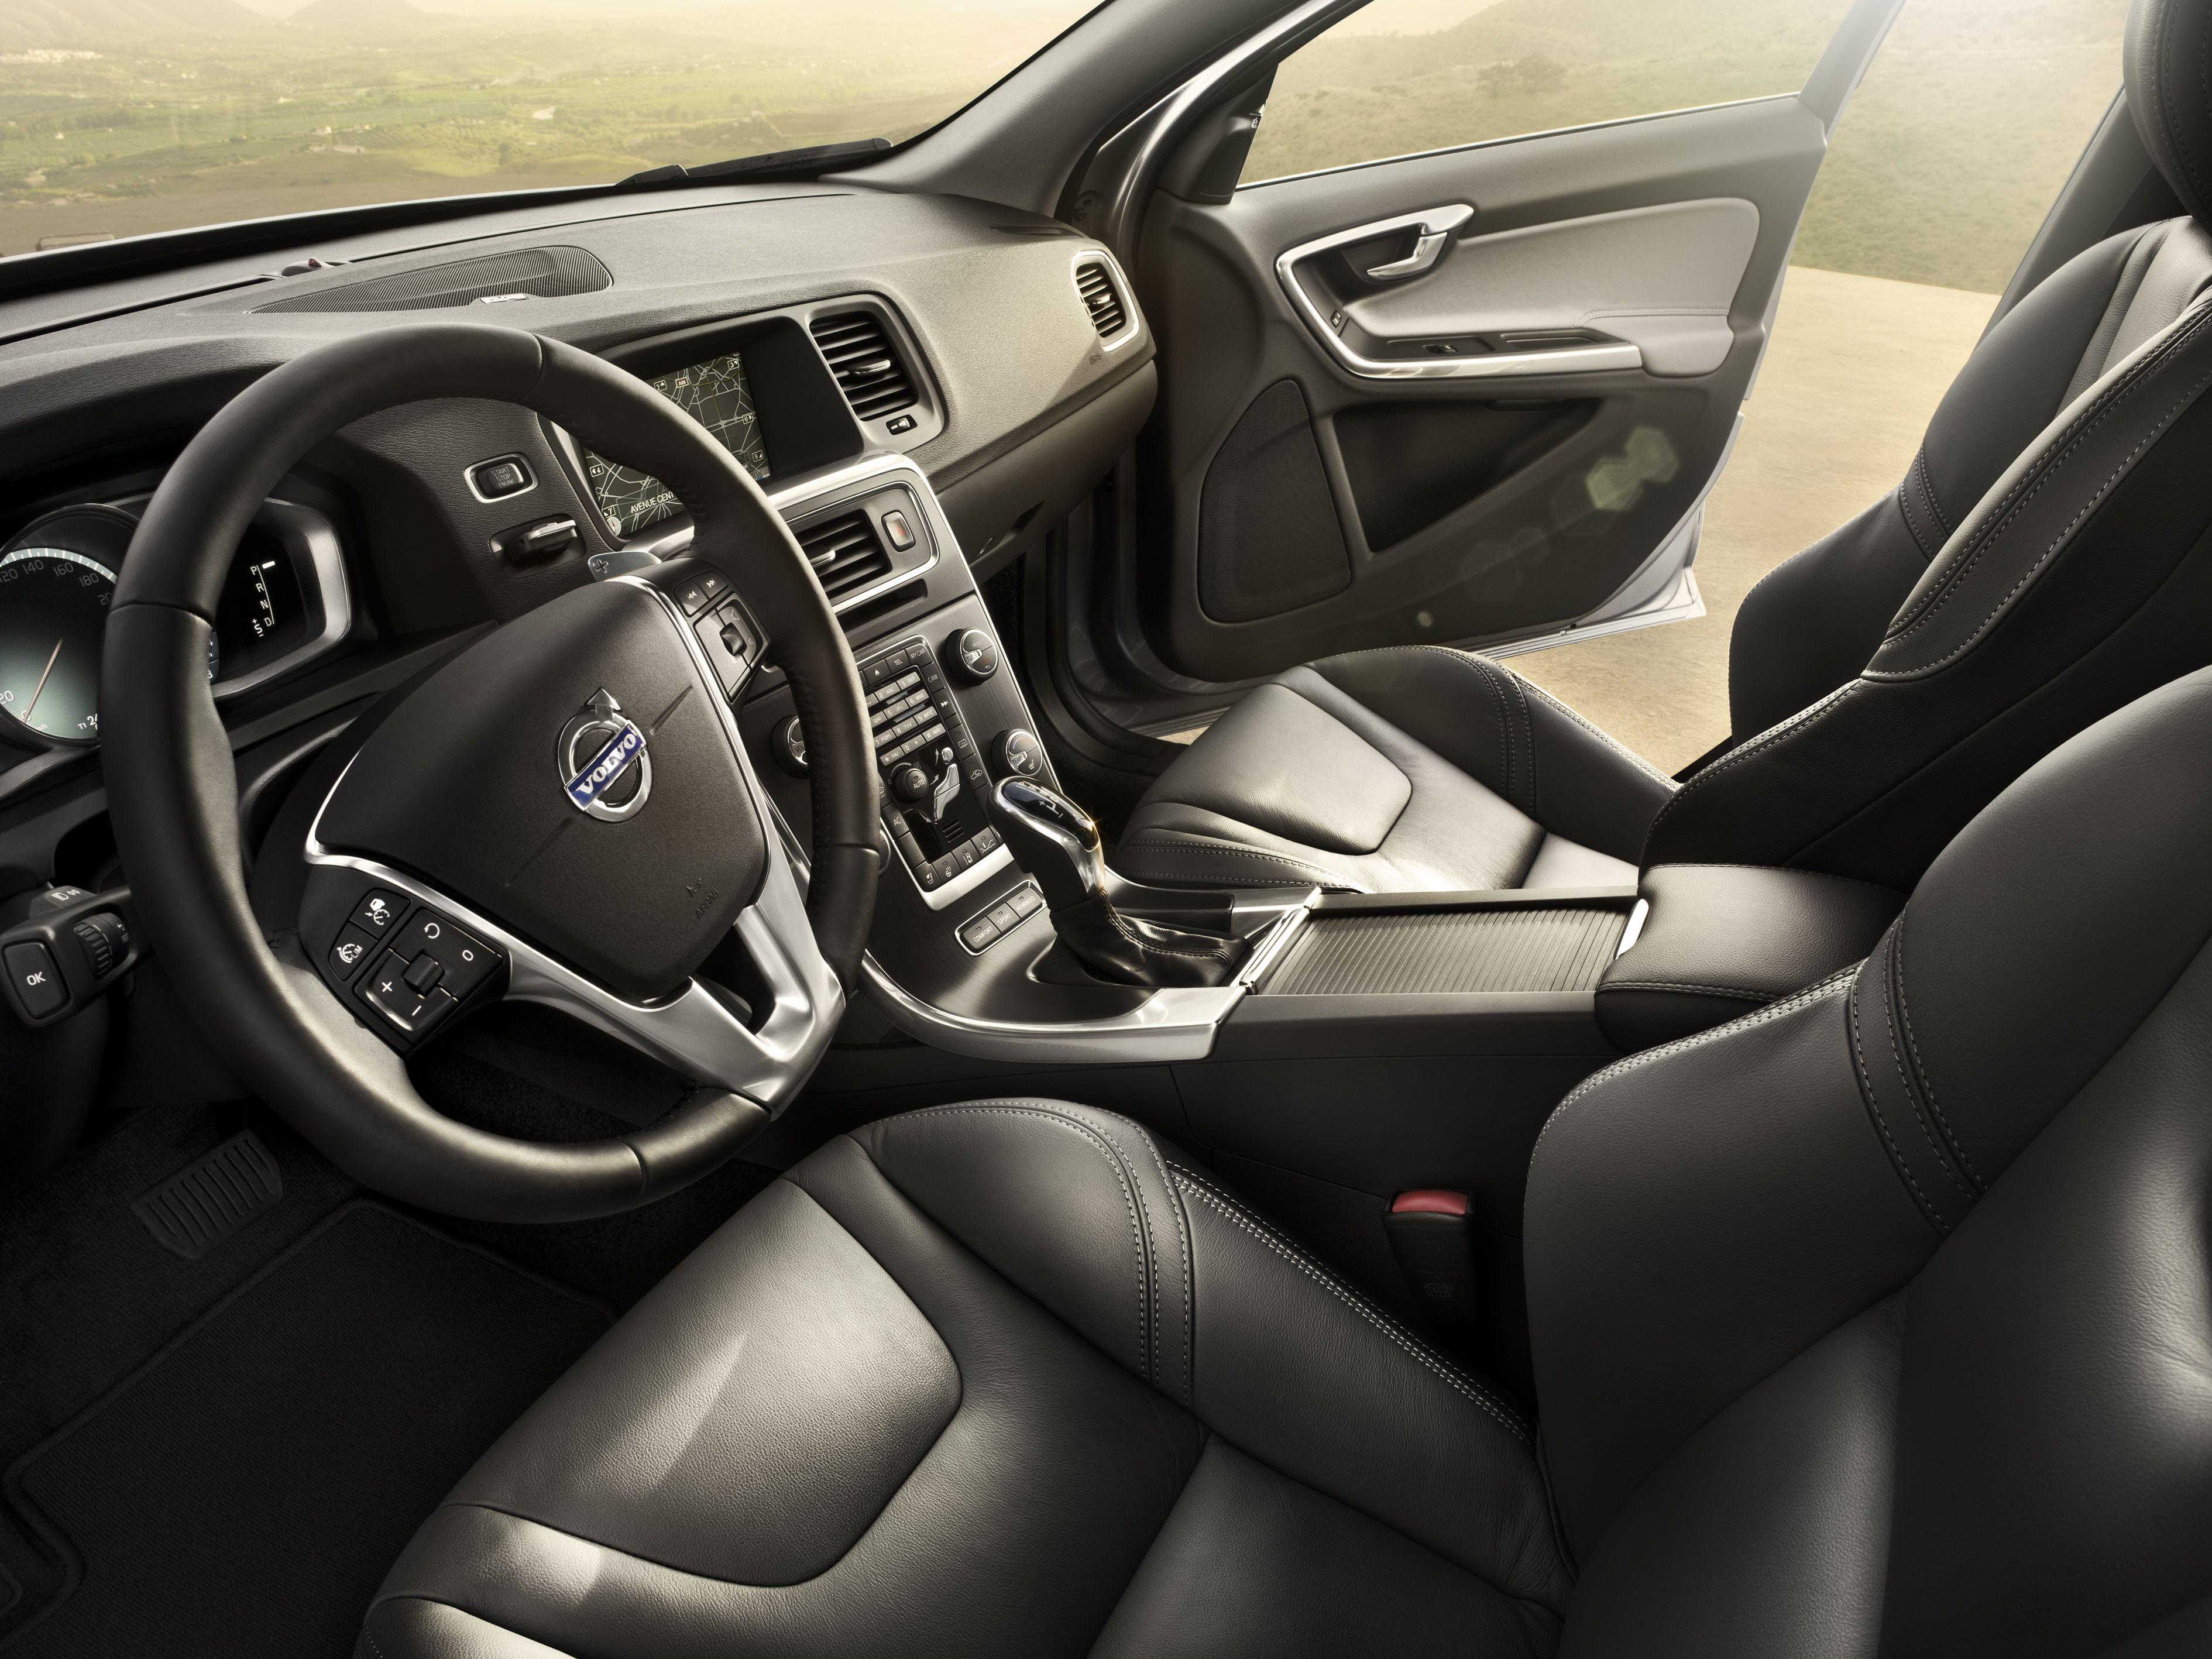 Volvo V60 interieur | Volvo V60 Bouwjaar 2014 | Pinterest